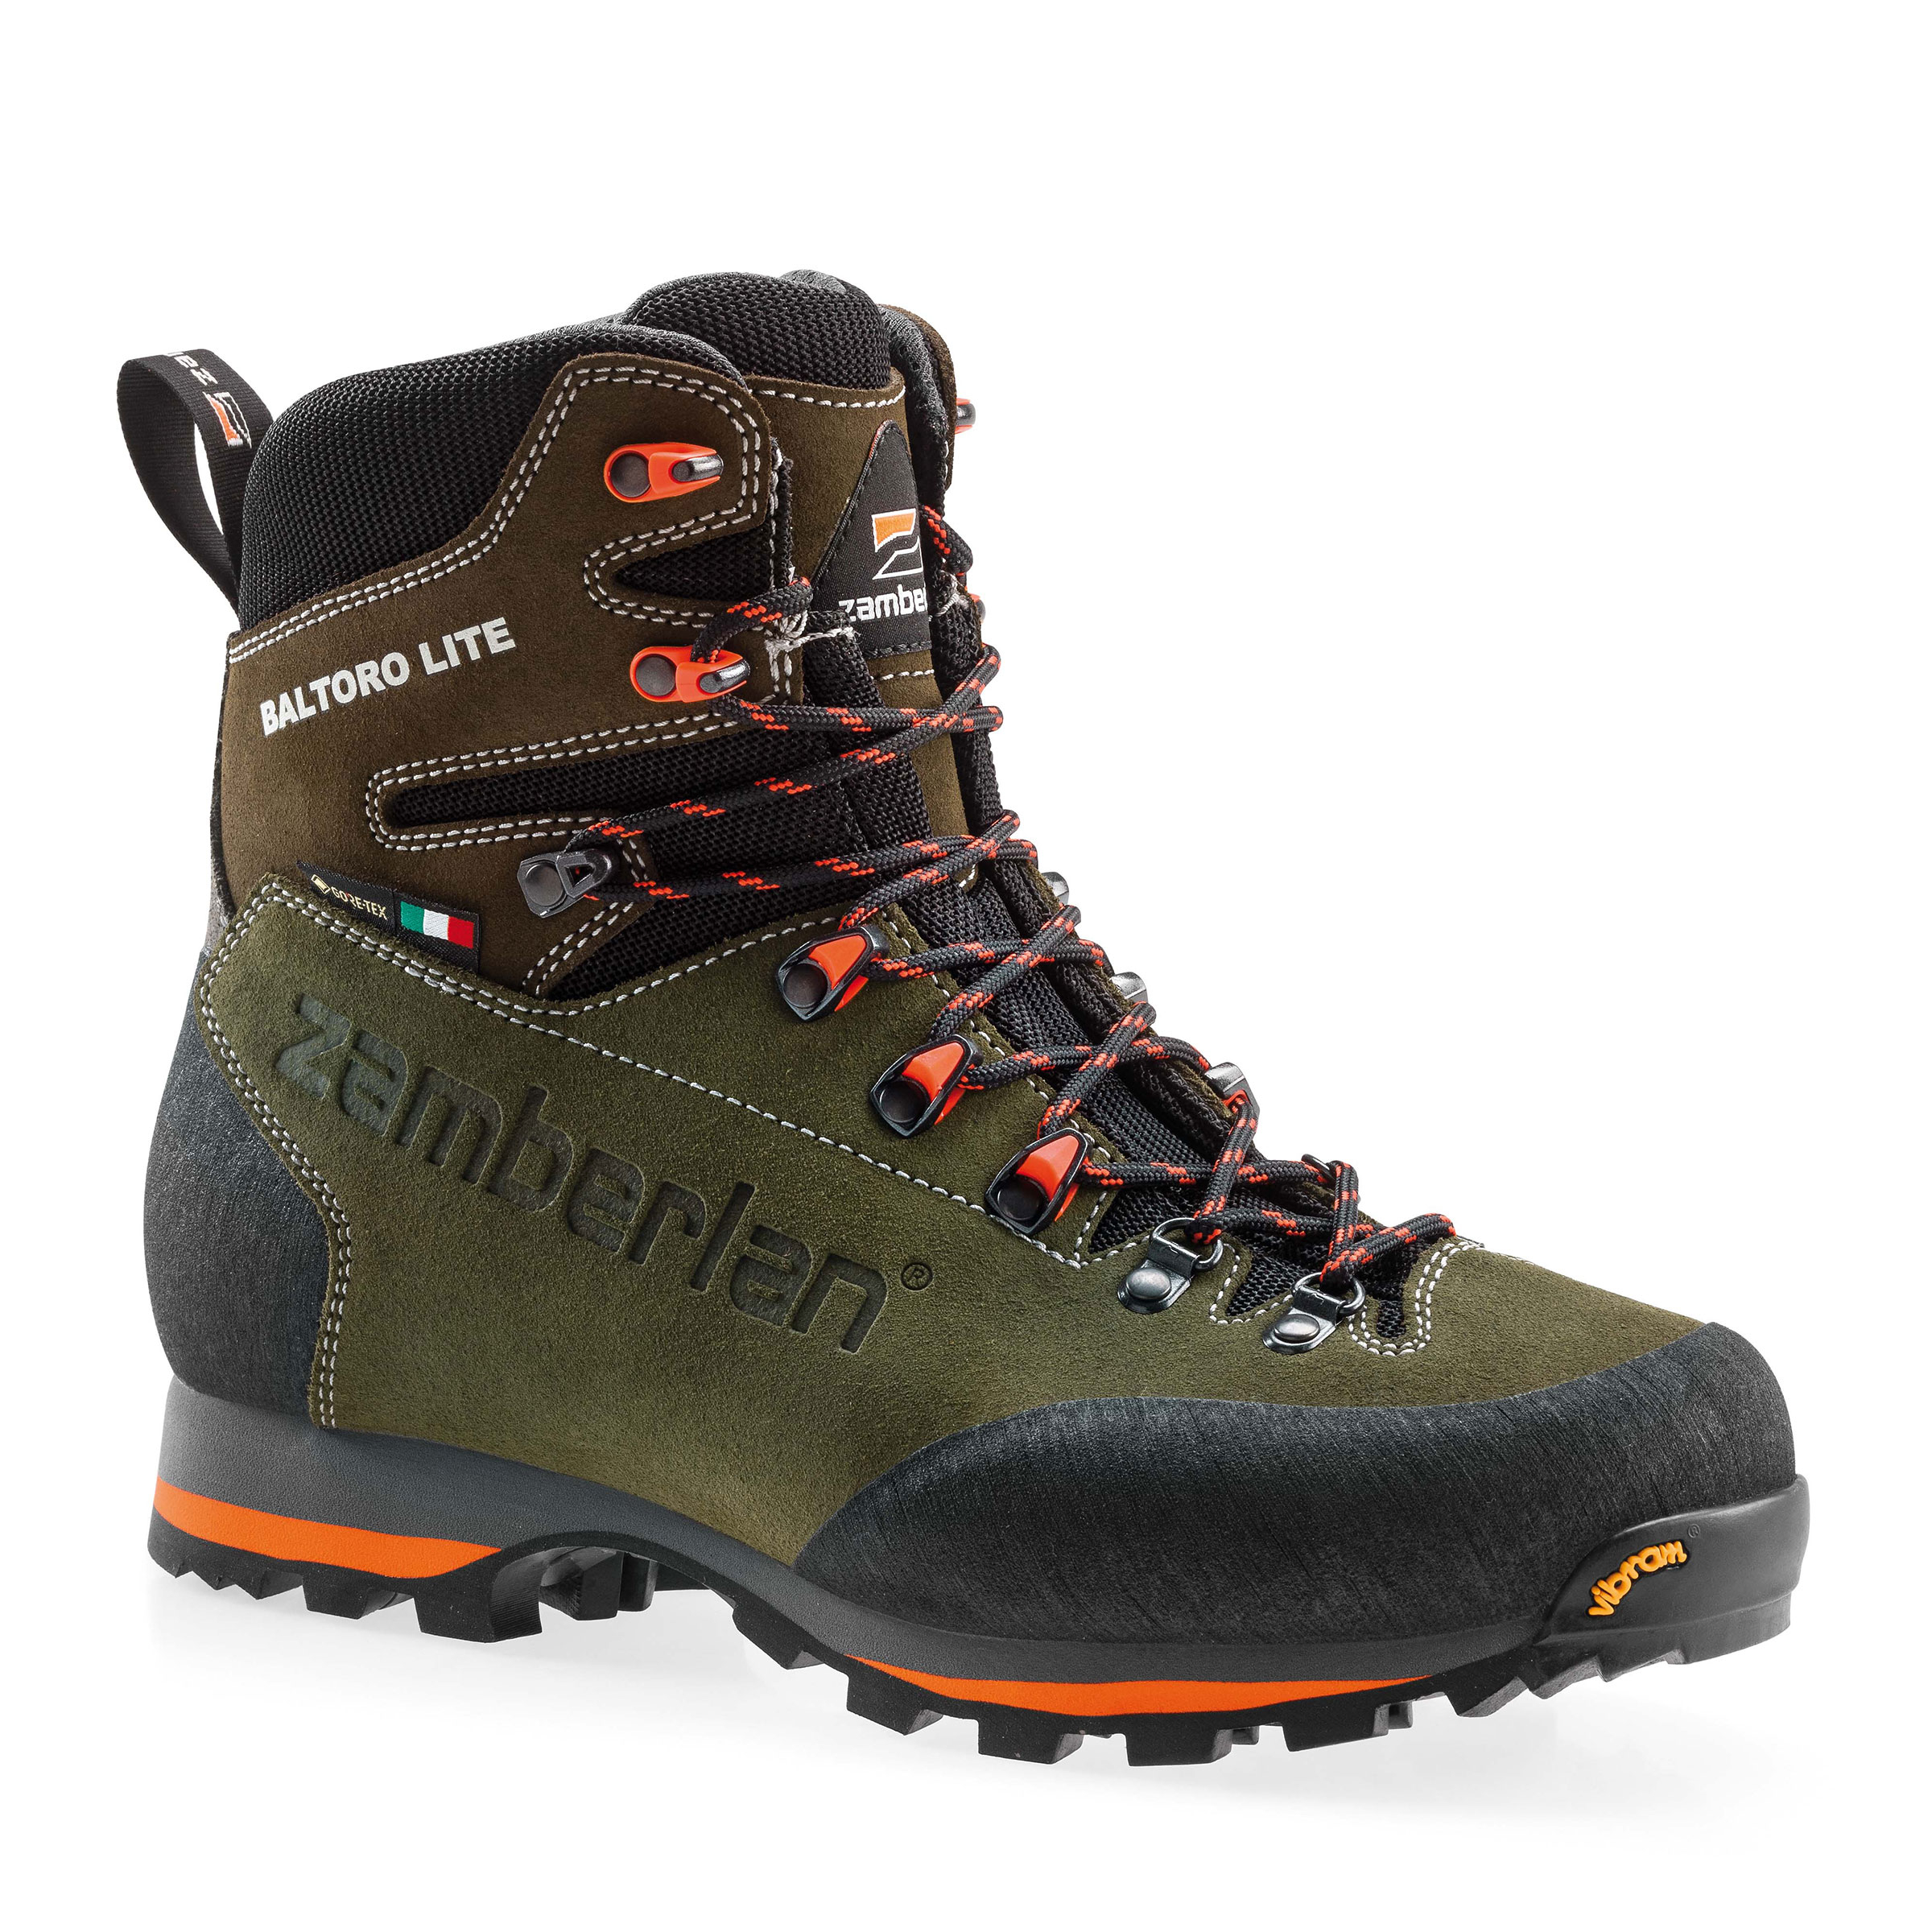 1110 BALTORO LITE GTX® RR   -   Men's Hunting Boots   -   Musk